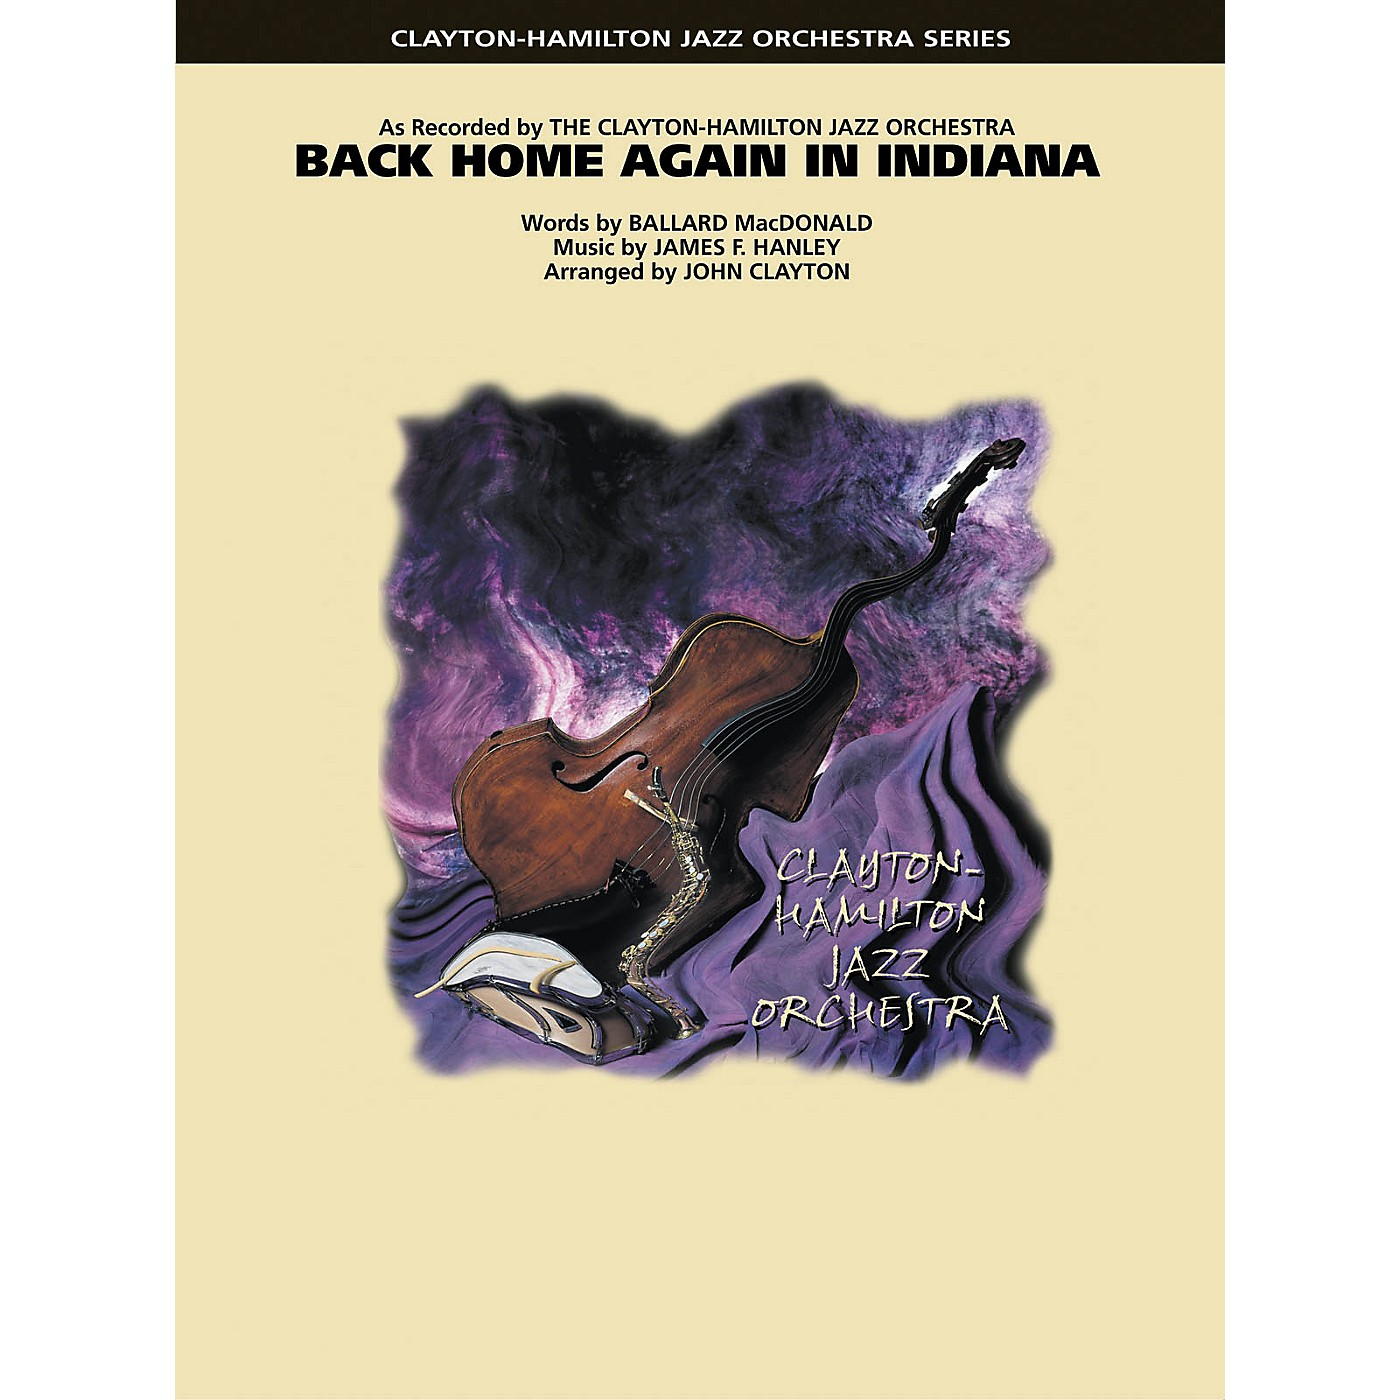 Hal Leonard Back Home Again in Indiana Jazz Band Level 5 Arranged by John Clayton thumbnail